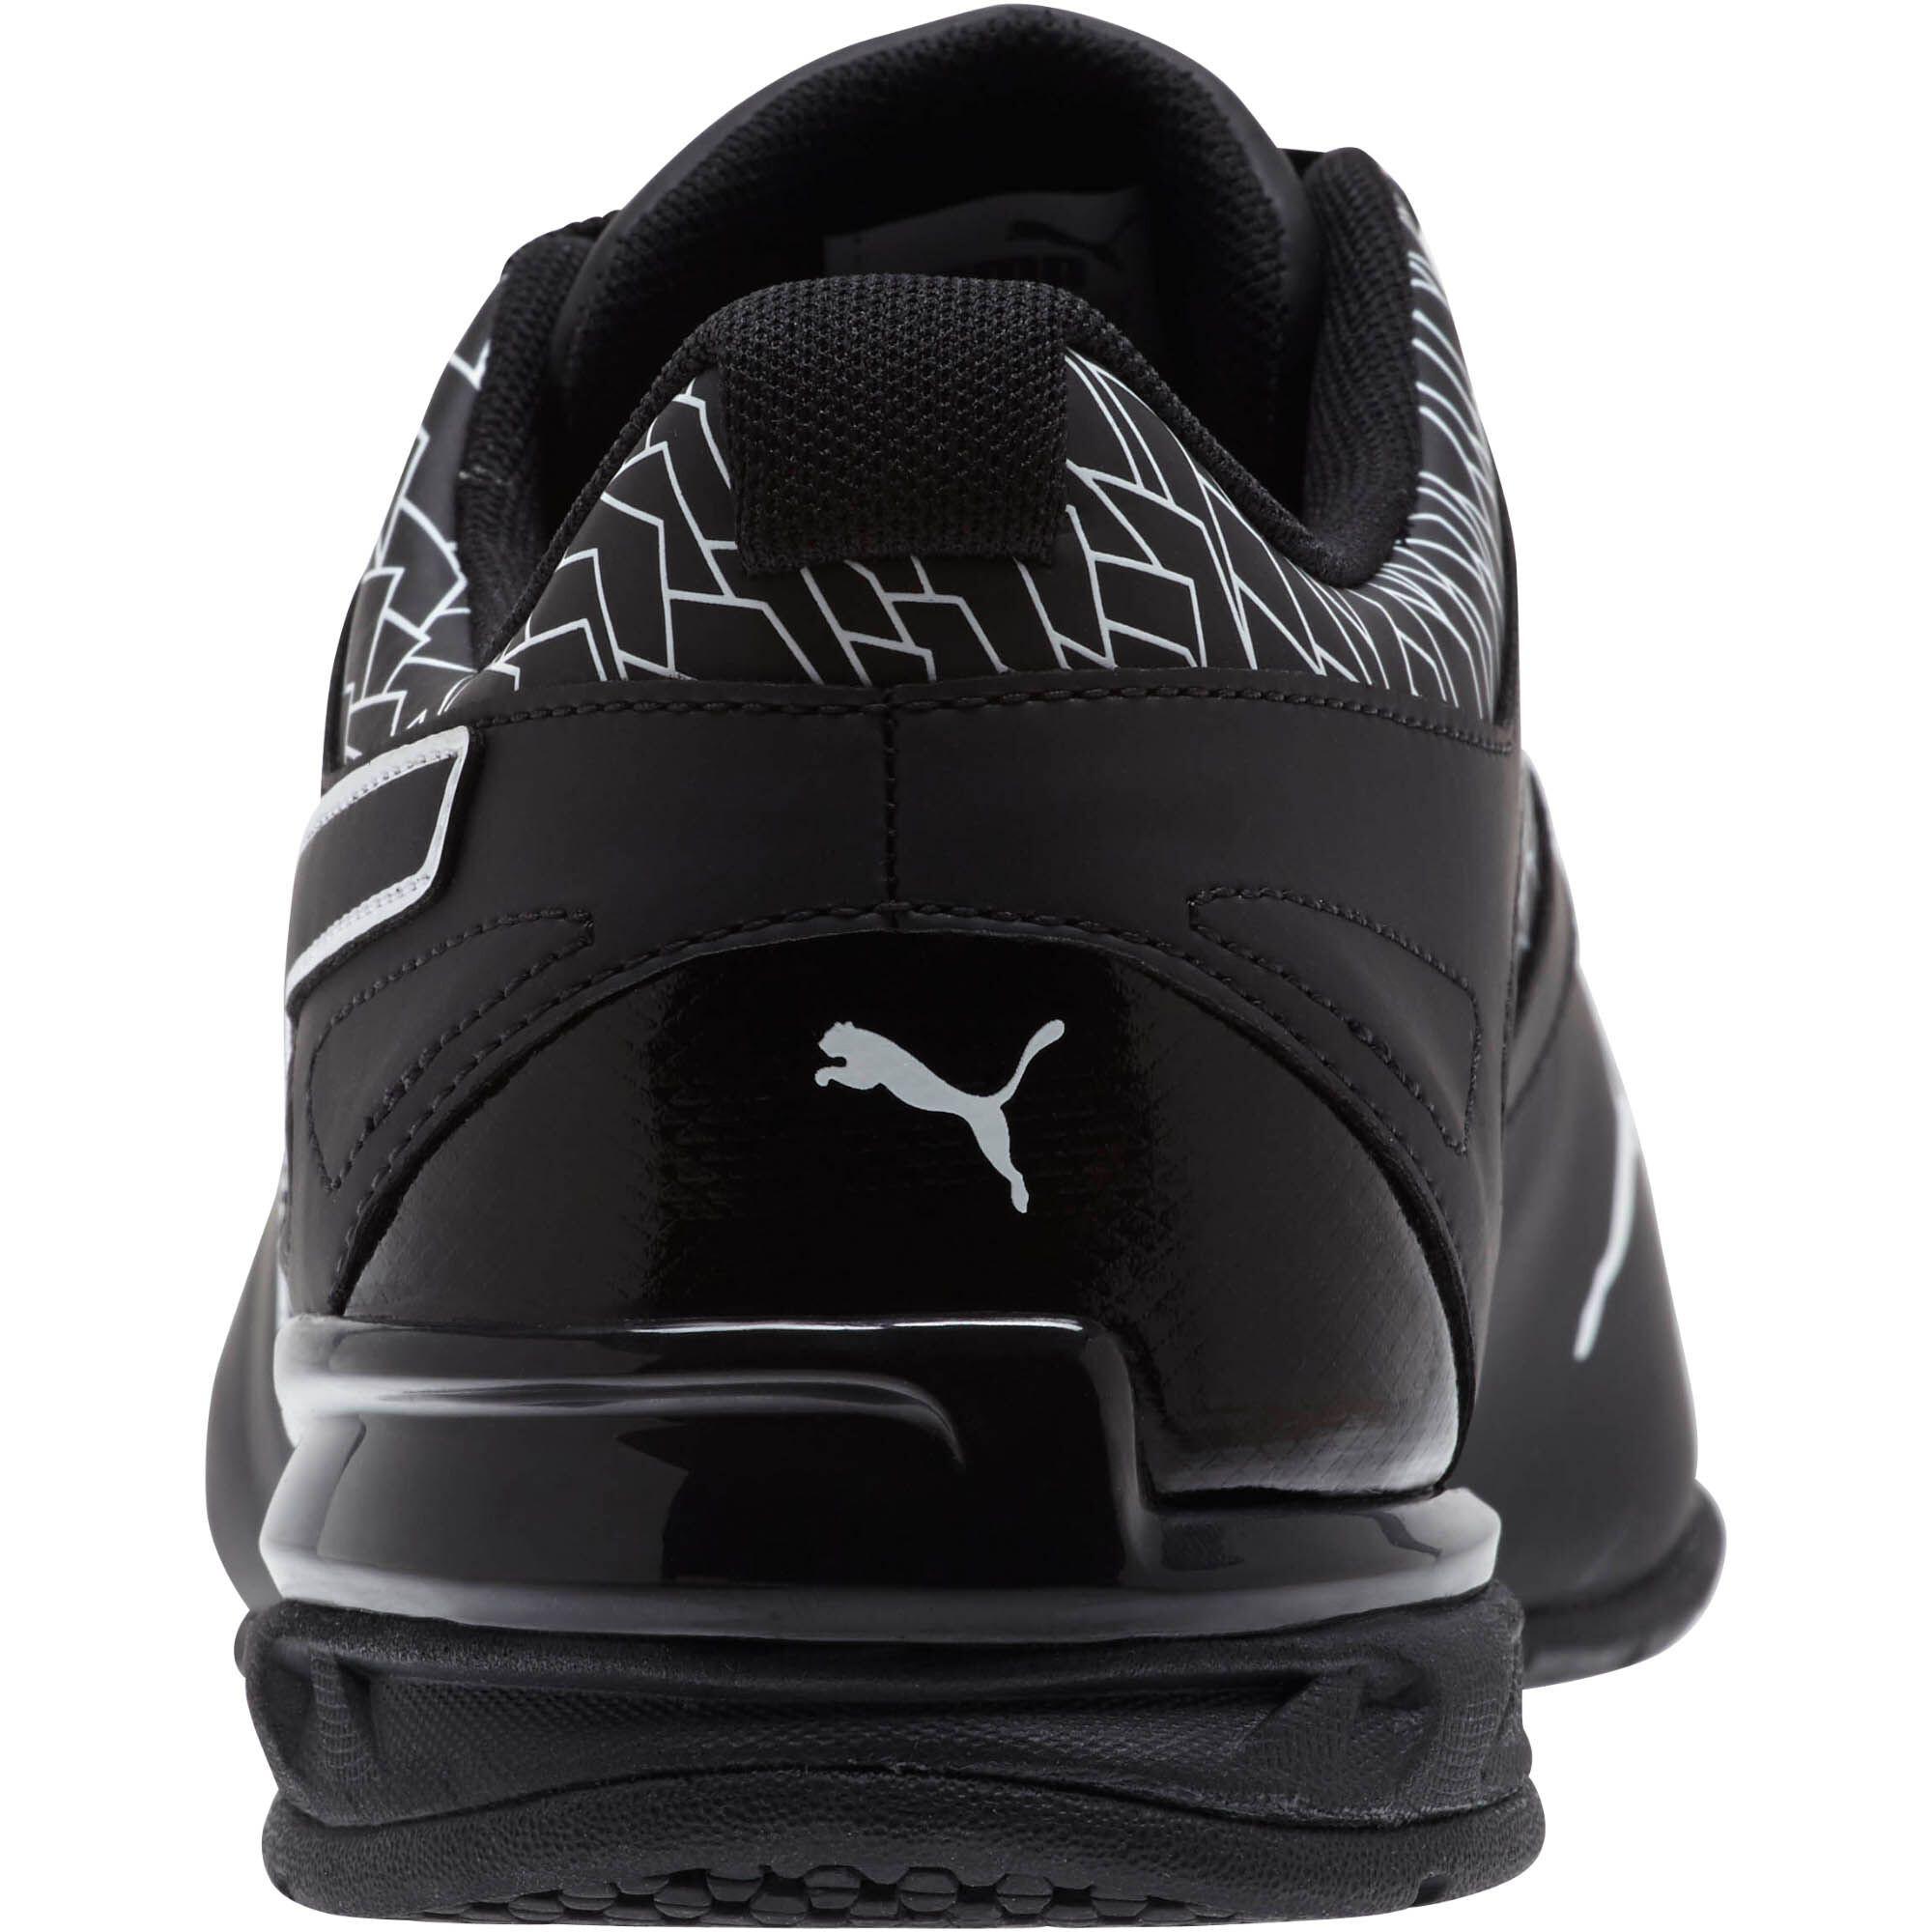 thumbnail 14 - PUMA Men's Tazon 6 Fracture FM Sneakers